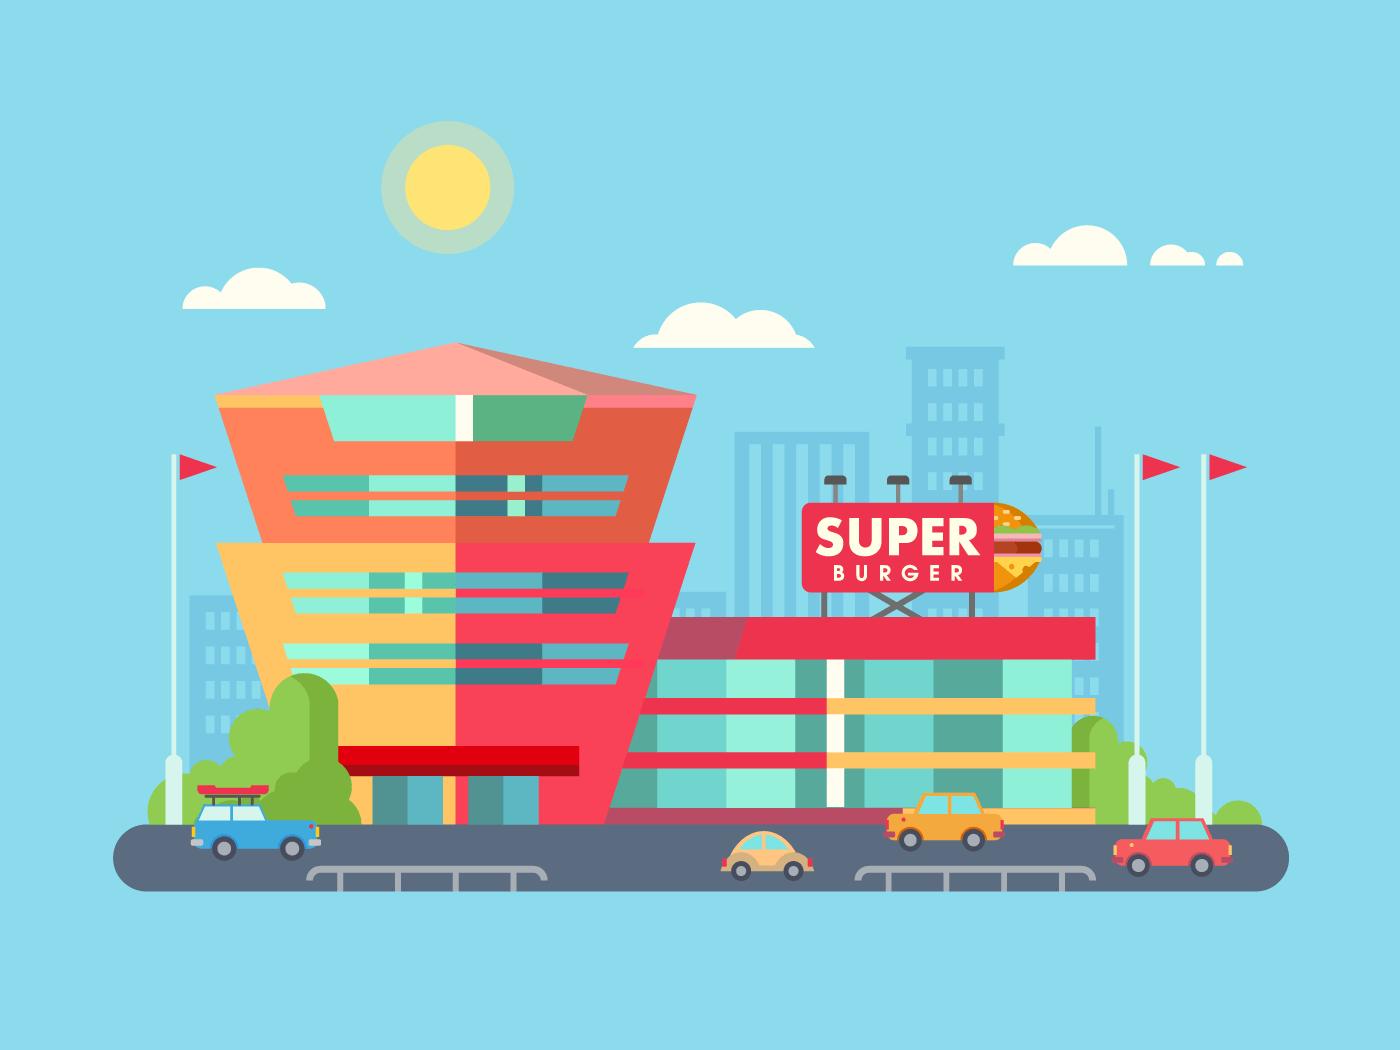 Supermarket building vector illustration